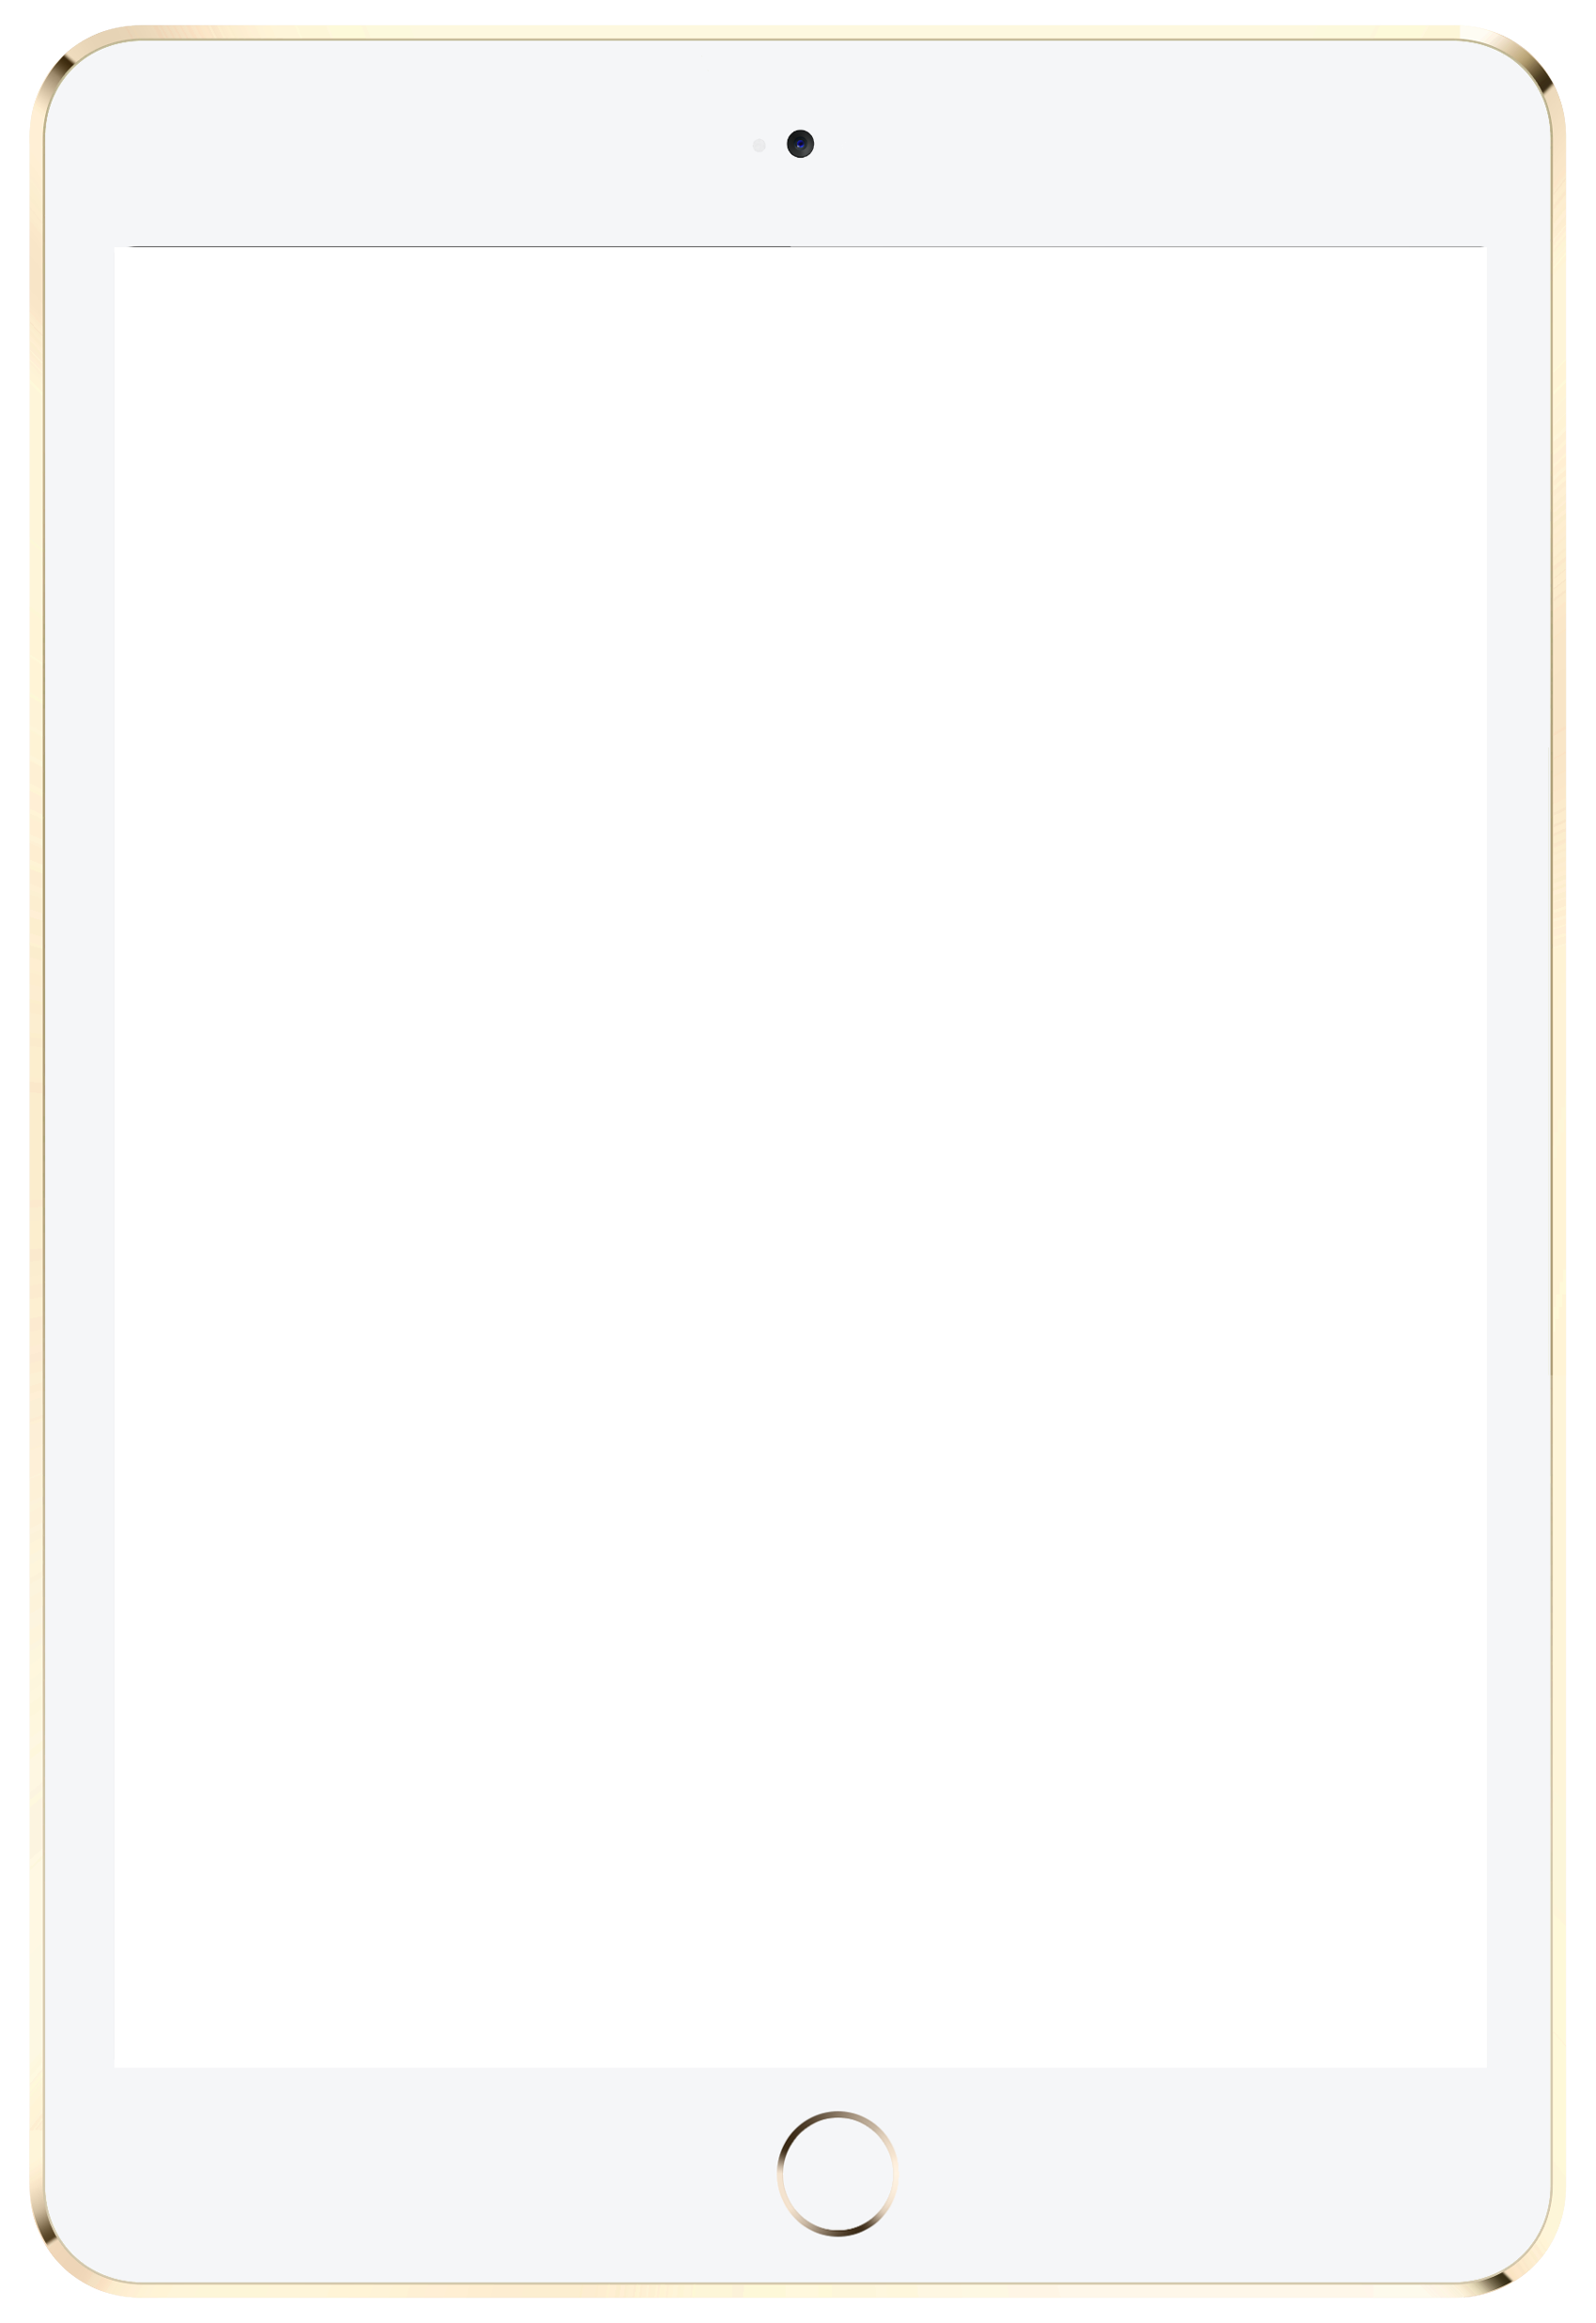 IPad Tablet PNG Transparent Image - Ipad PNG